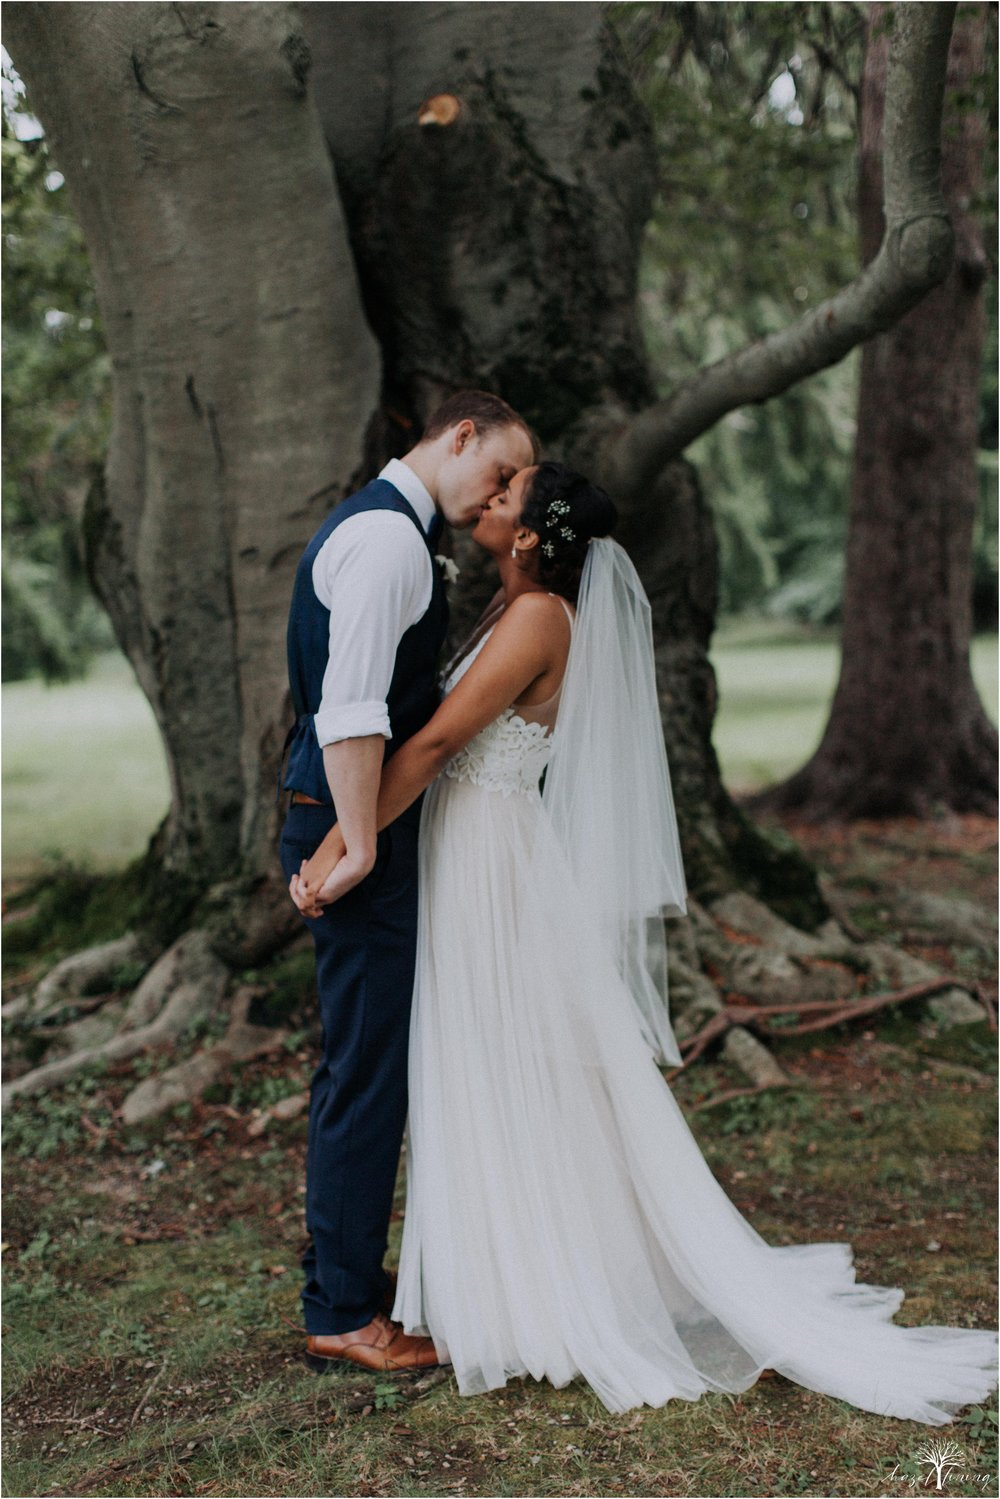 mariah-kreyling-samuel-sherratt-sherrattwiththeworld-peirce-farm-at-witch-hill-boston-massachusetts-wedding-photography-hazel-lining-travel-wedding-elopement-photography_0116.jpg